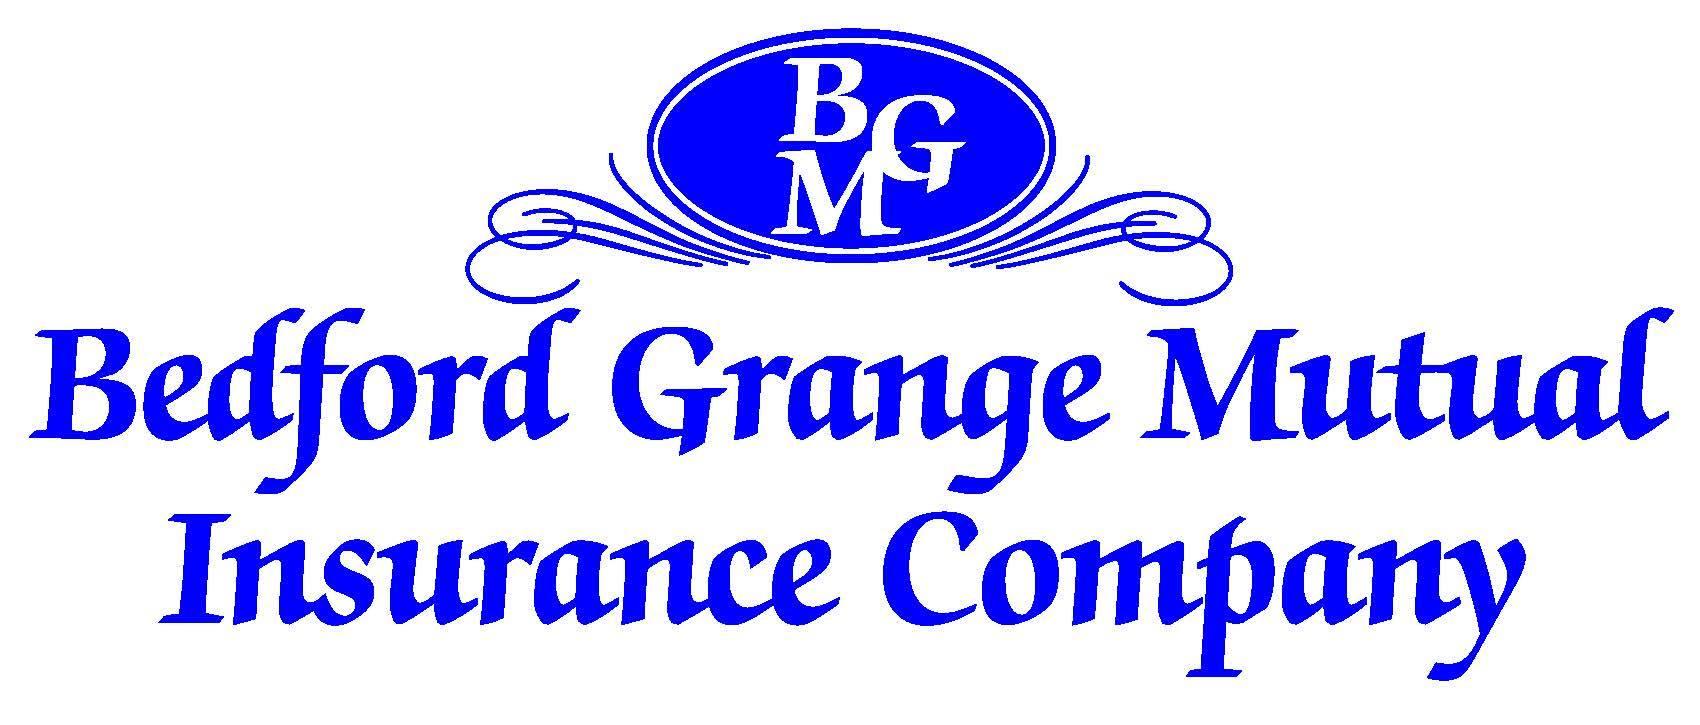 Bedford Mutual Grange Mutual Insurance Company